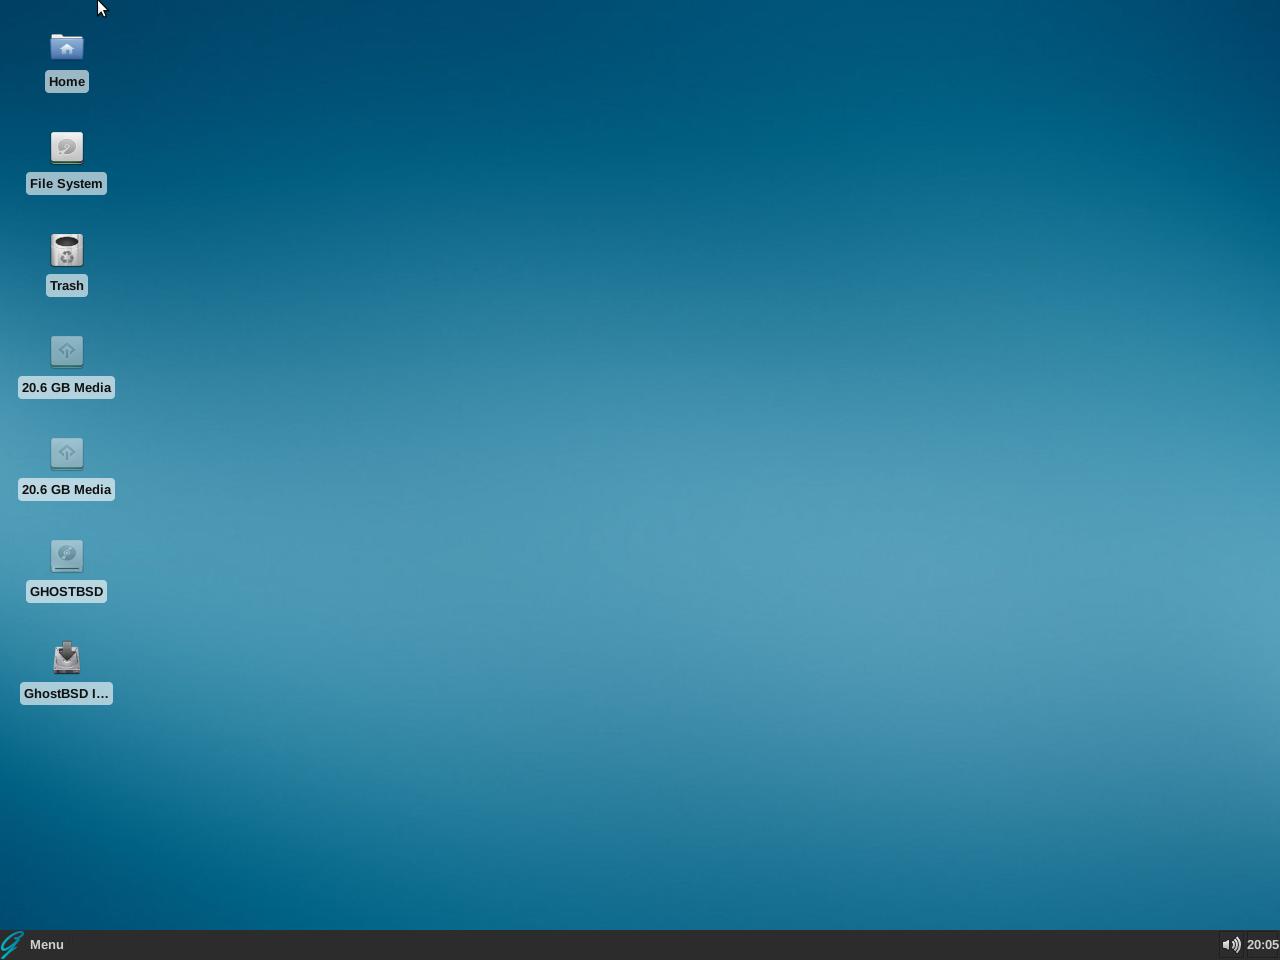 GhostBSD Xfce